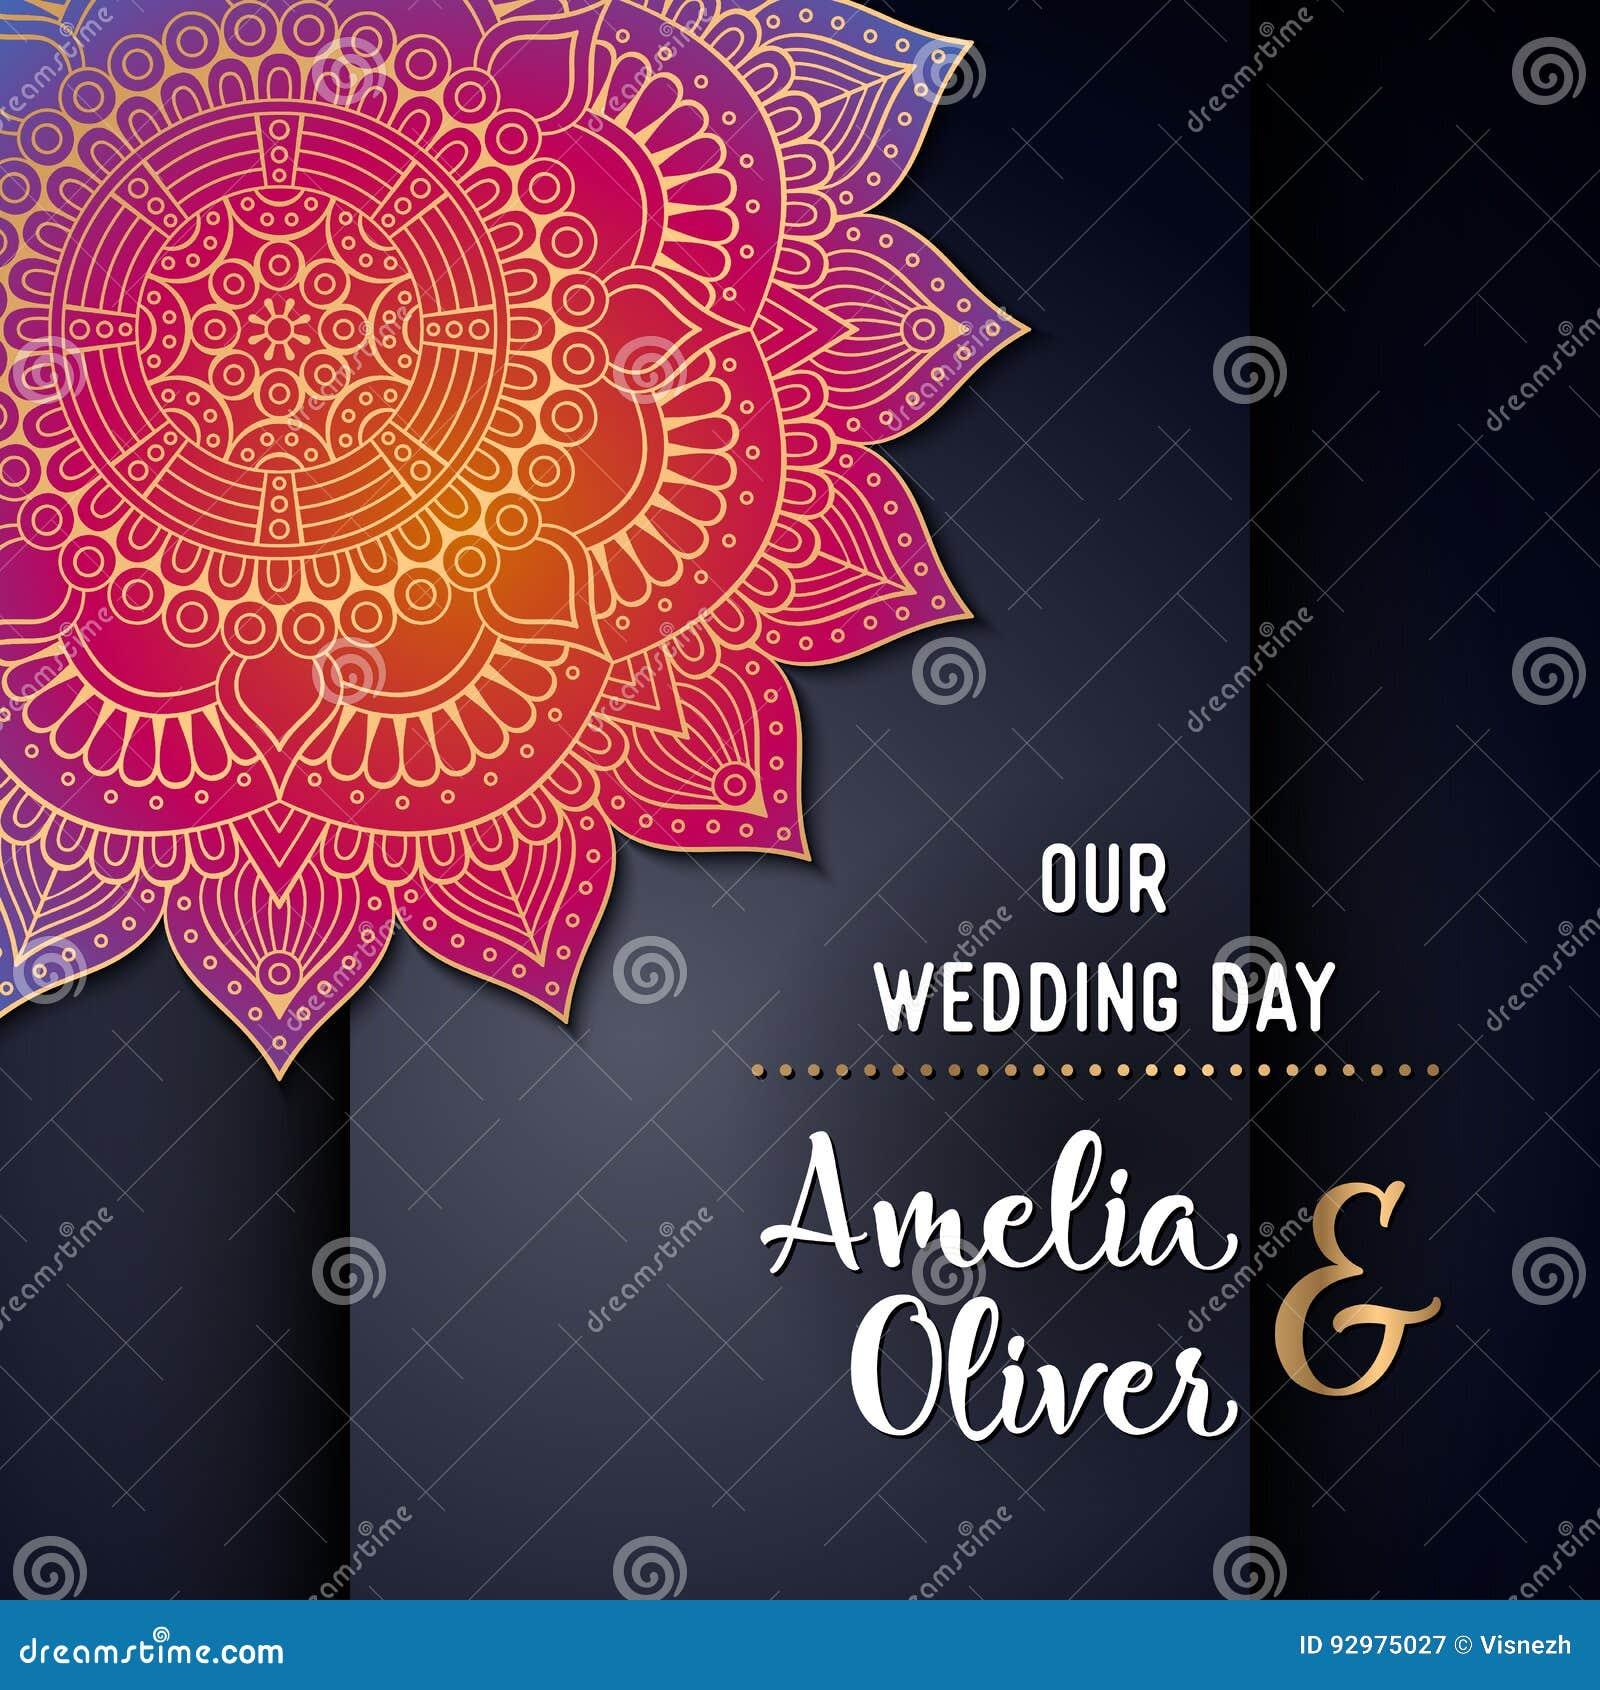 vector-luxury-wedding-invitation -mandala-business-cards-vintage-decorative-elements-92975027.jpg